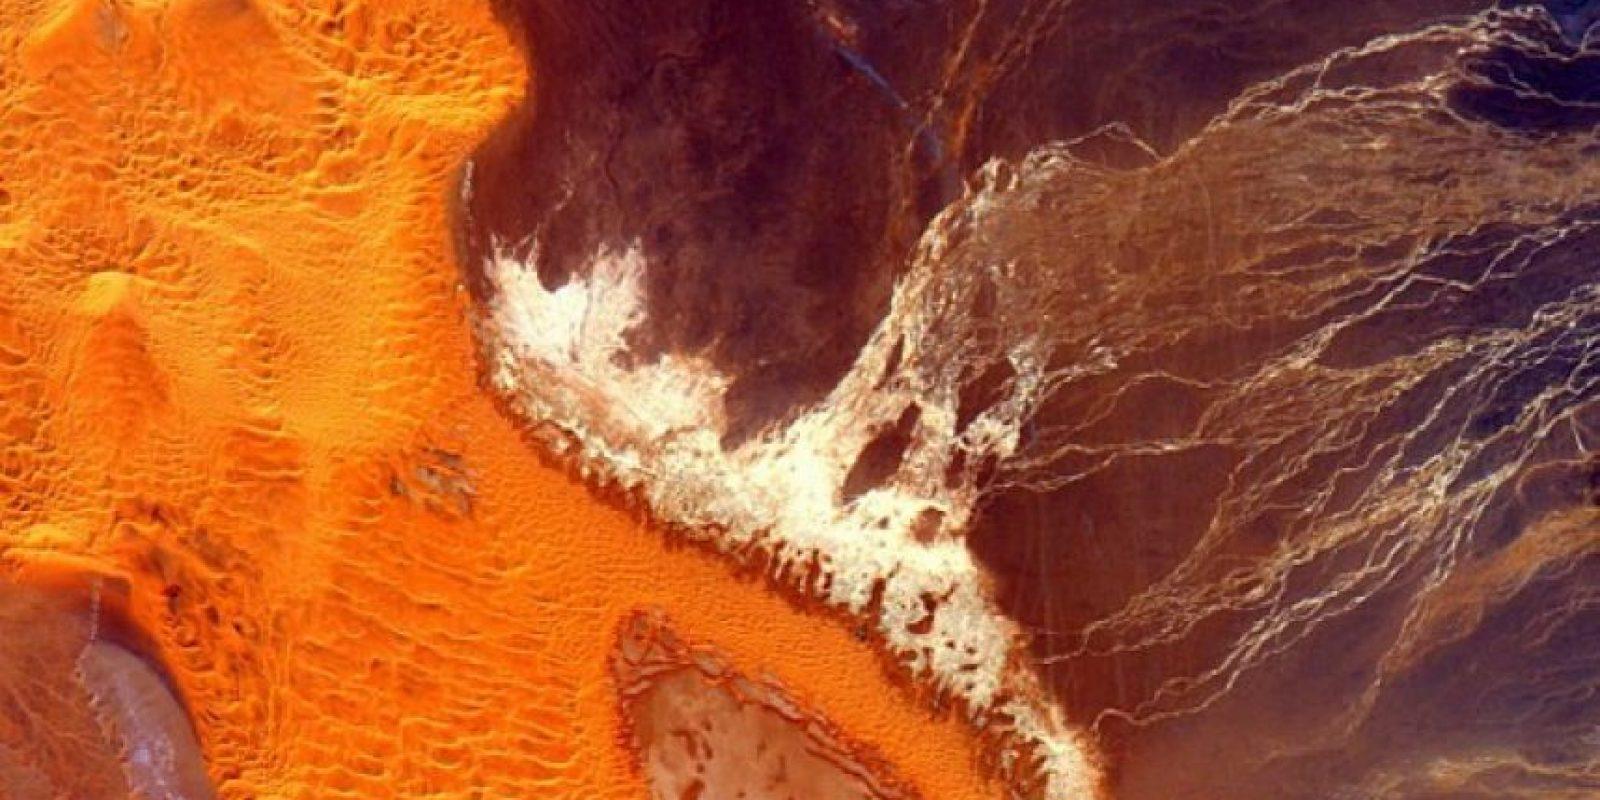 Desierto del Sahara Foto:Vía instagram.com/stationcdrkelly